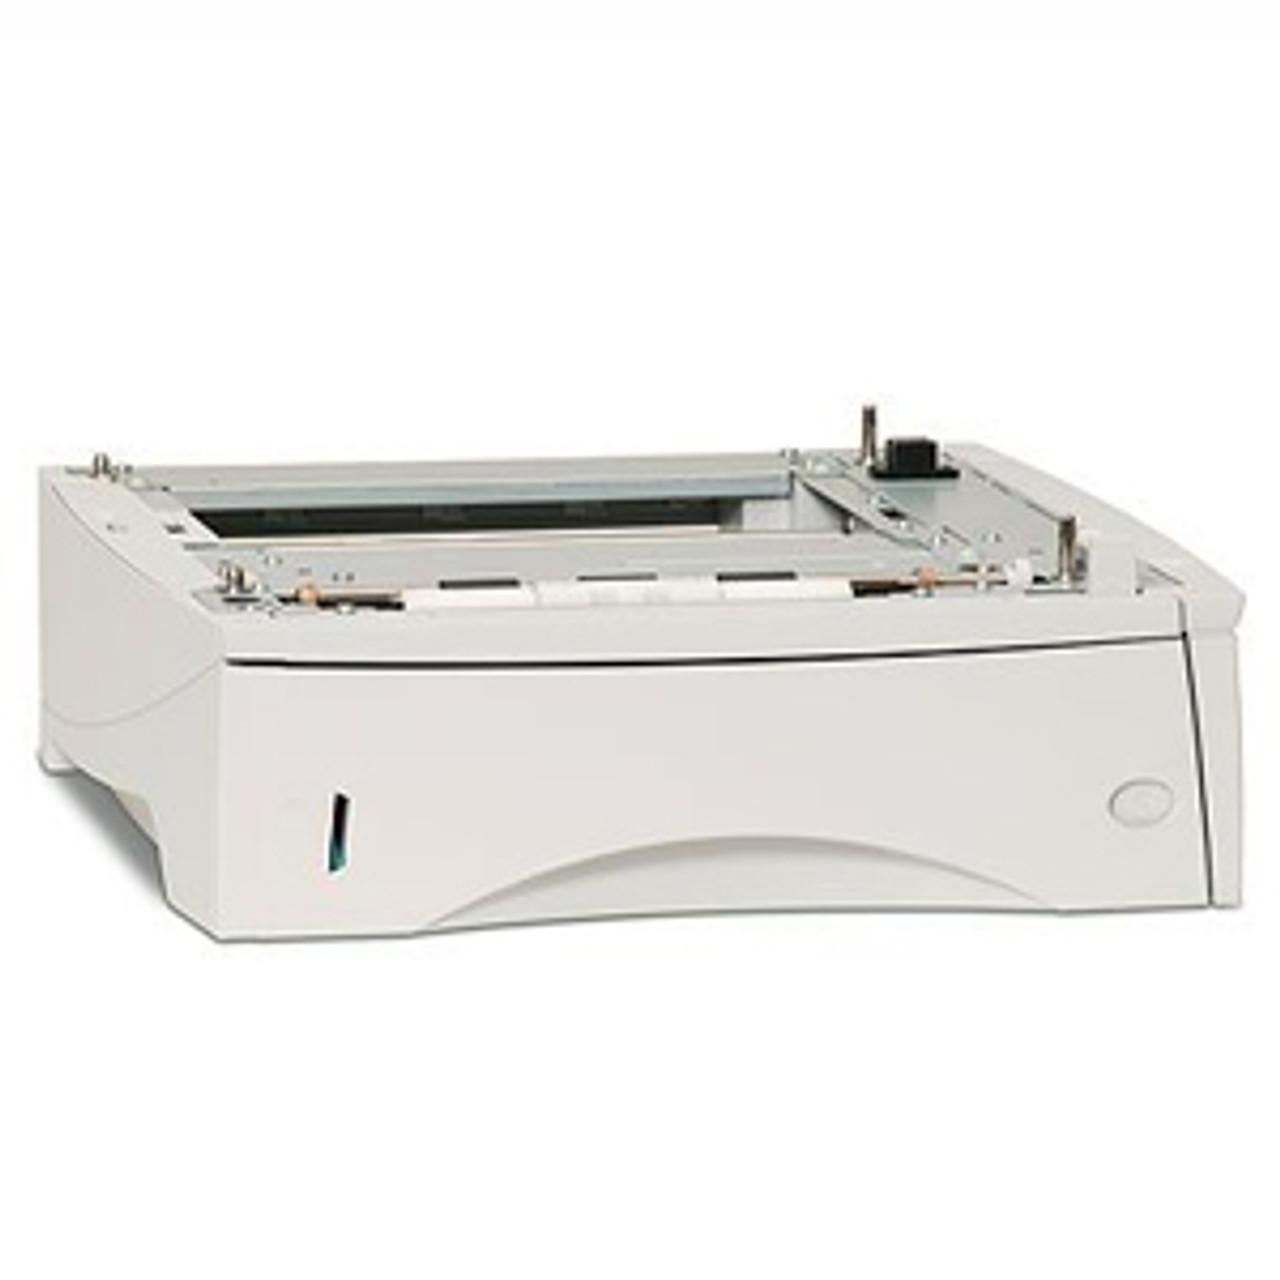 HP Media tray - 4250 4350 series 500 sheets